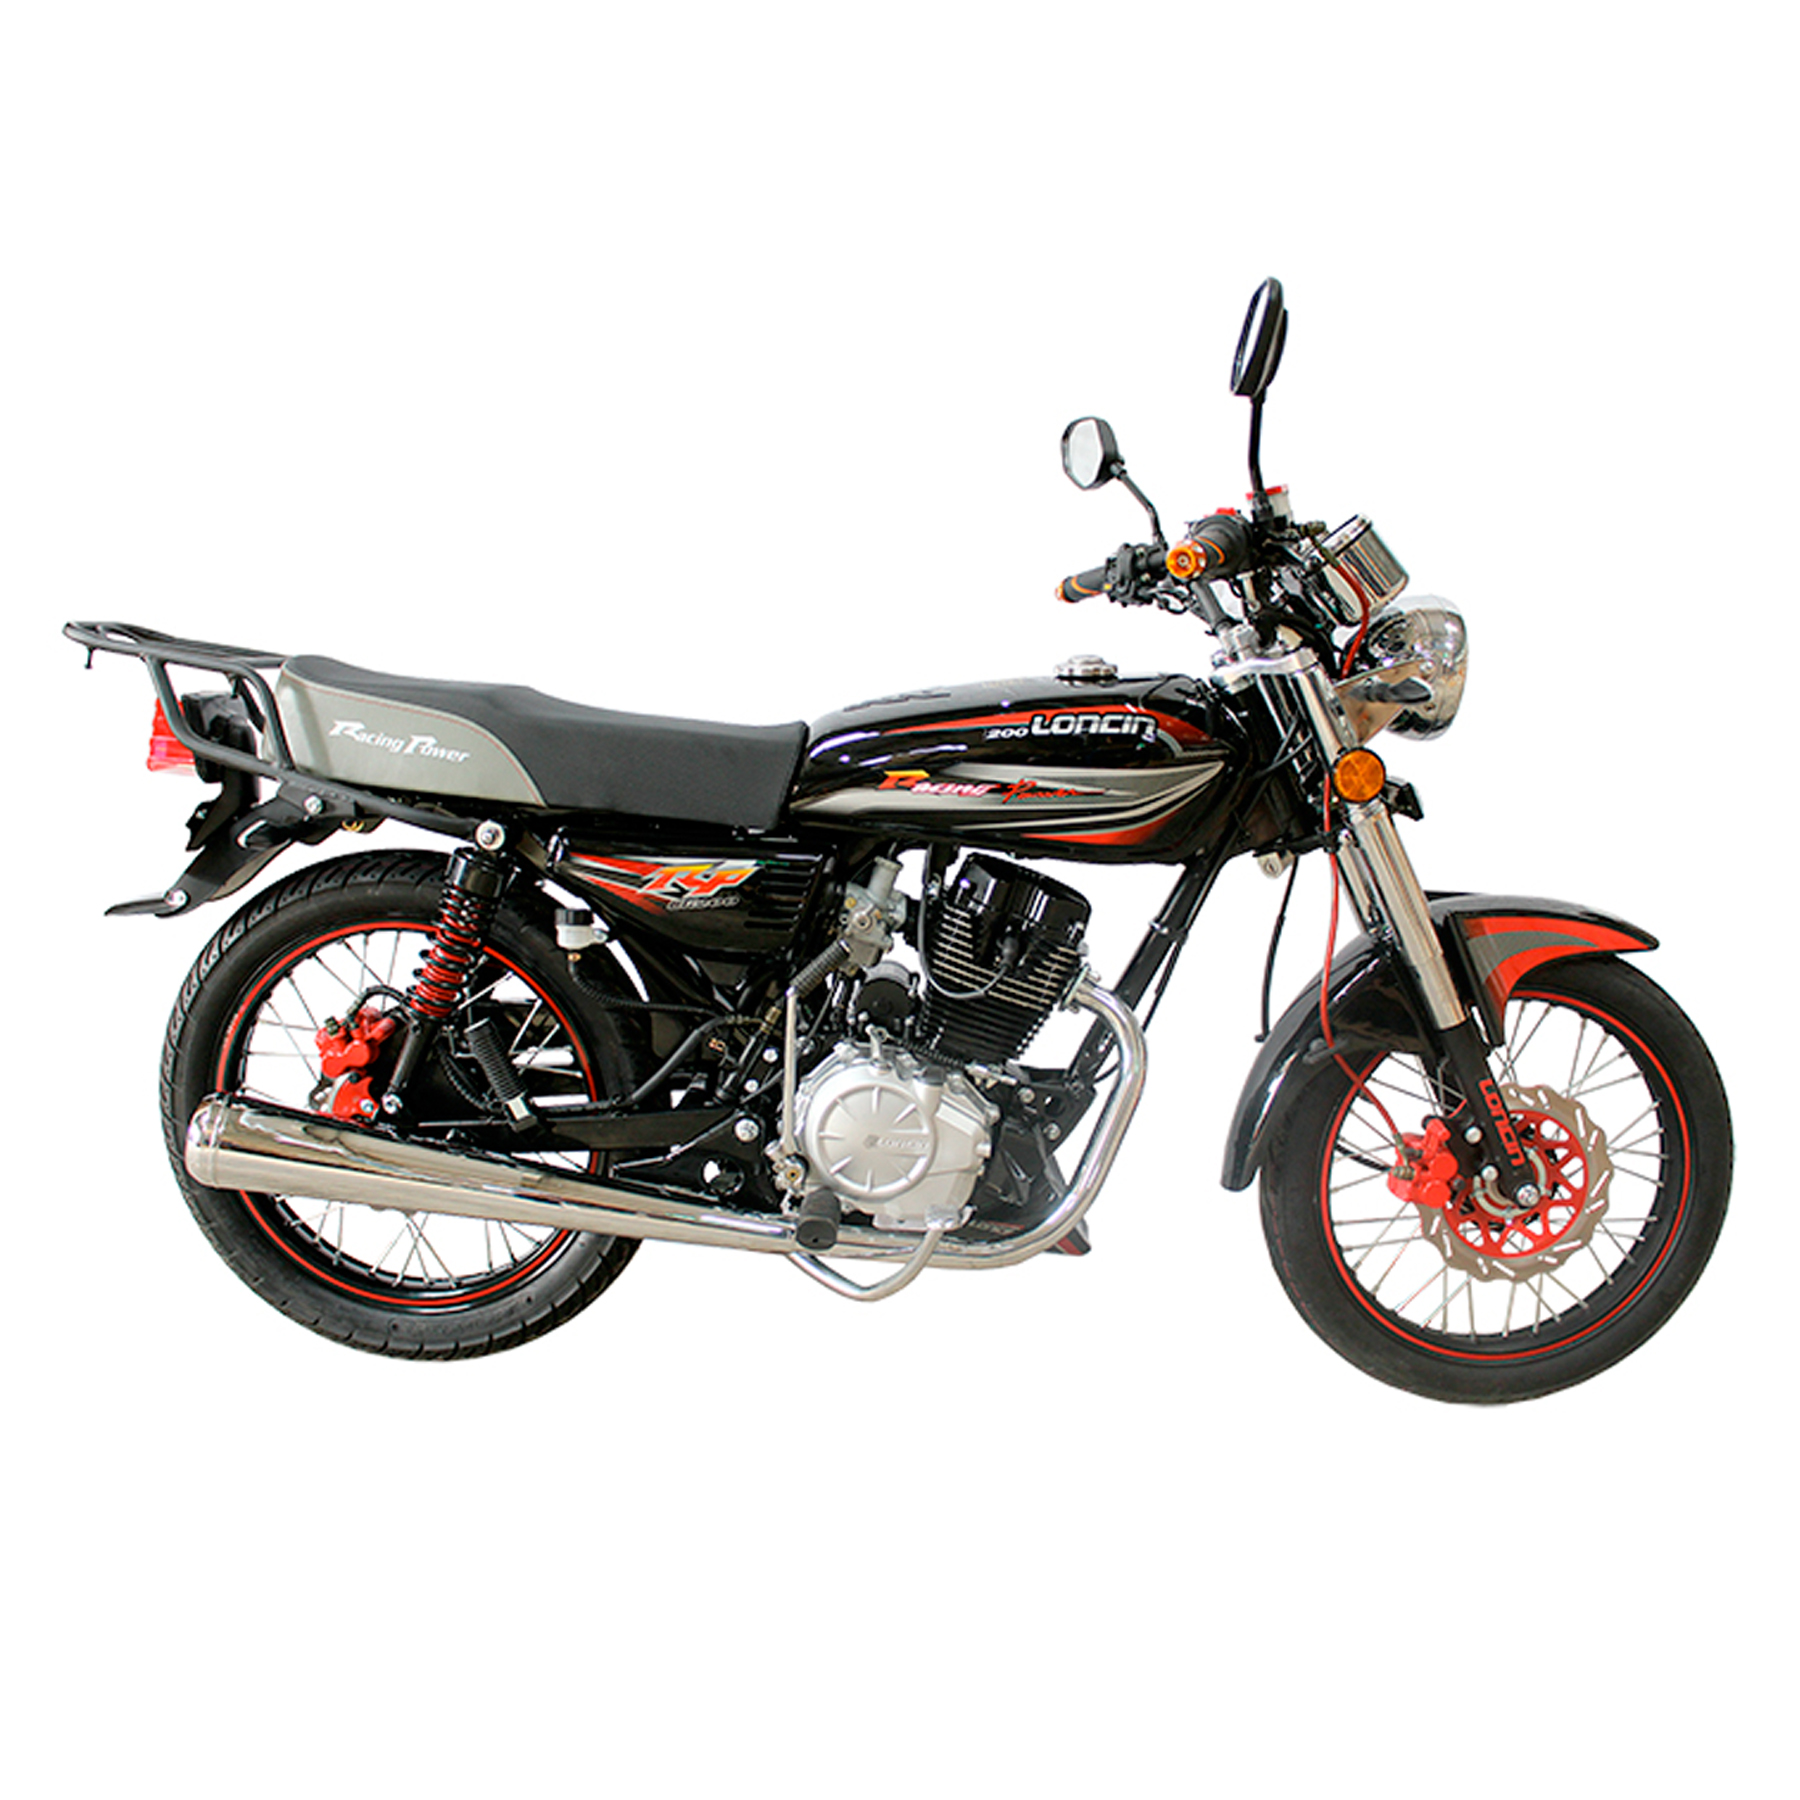 MOTORCYCLE LONCIN CG 200